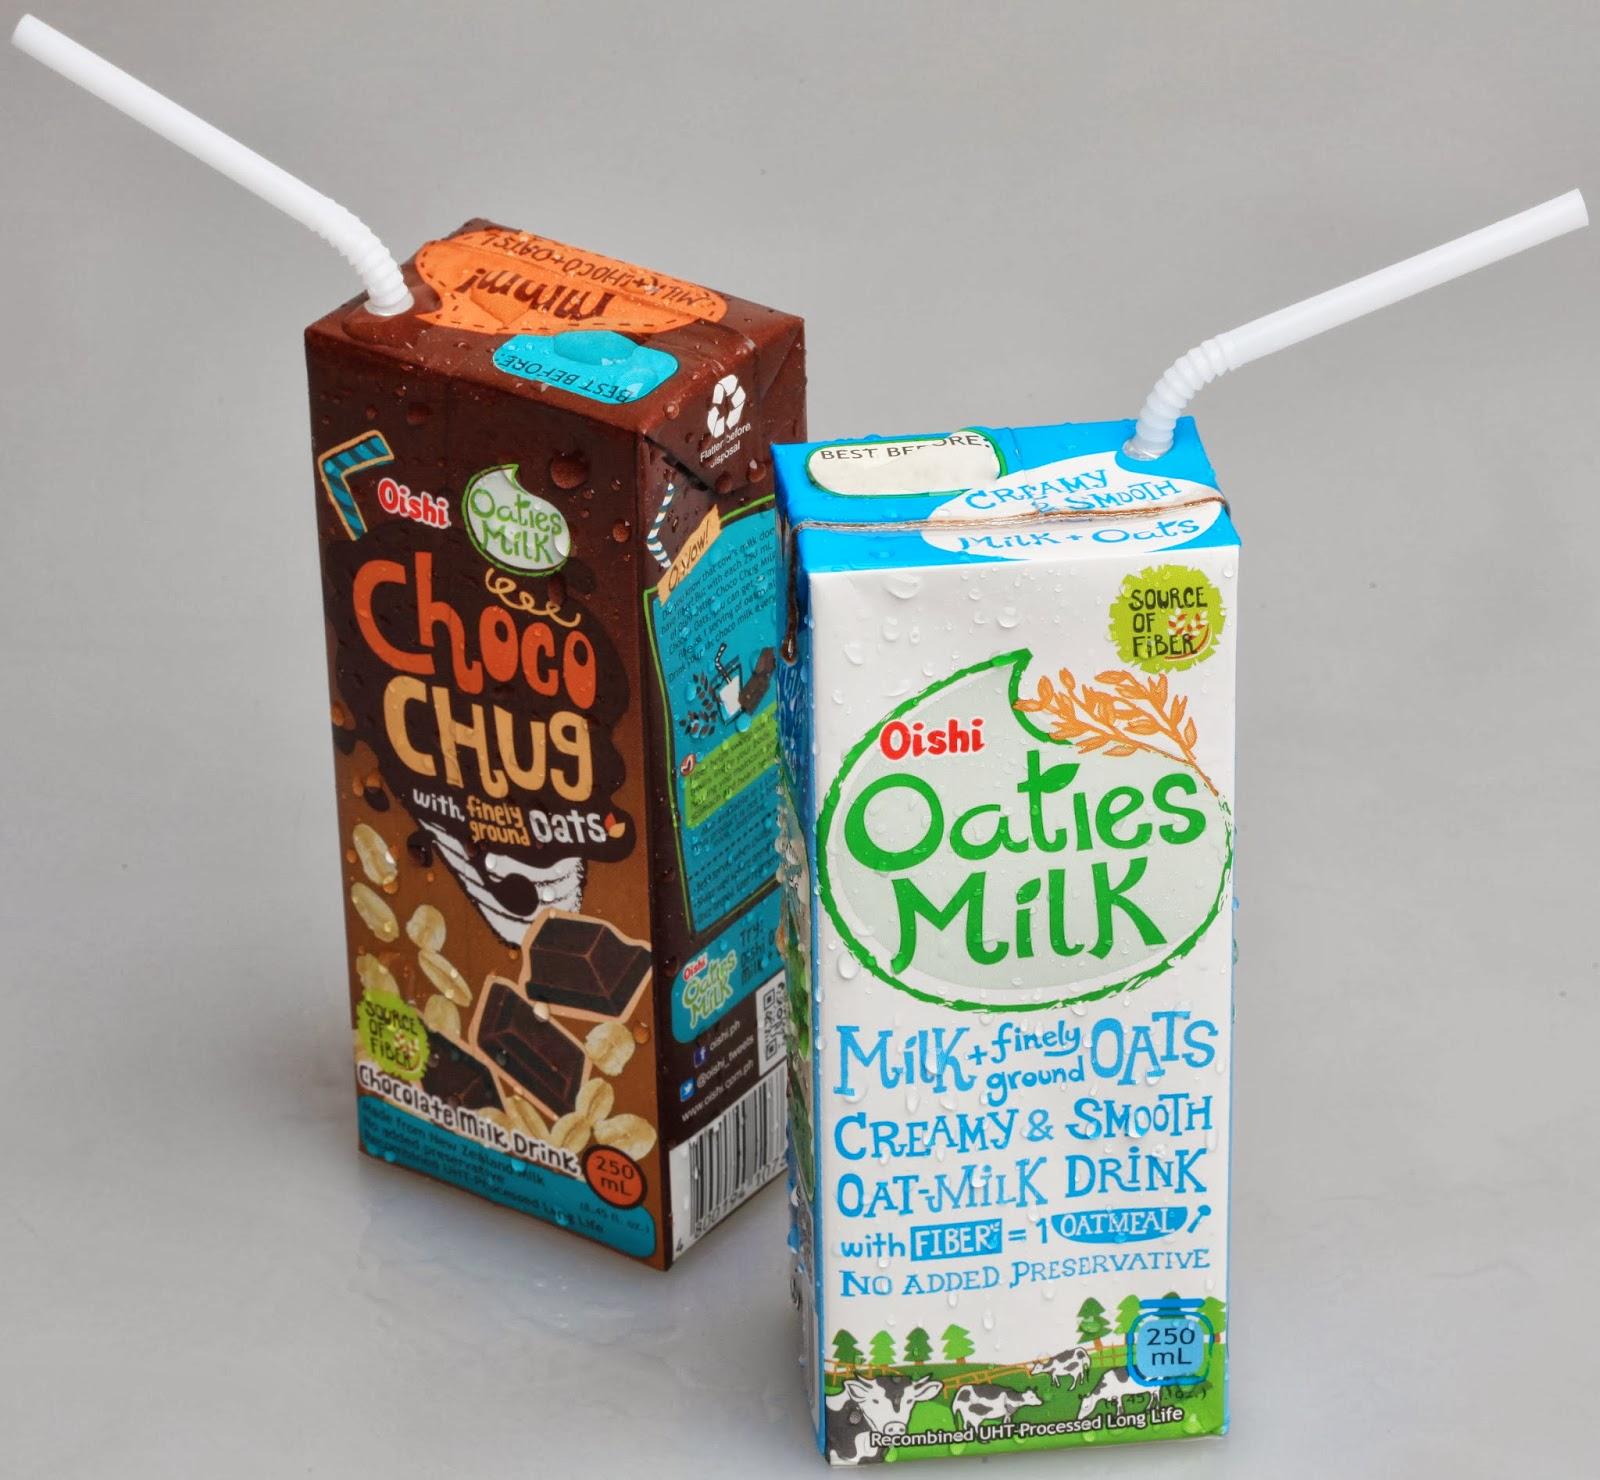 Favorite Weekend Drink: Oishi Oaties Milk and Choco Chug